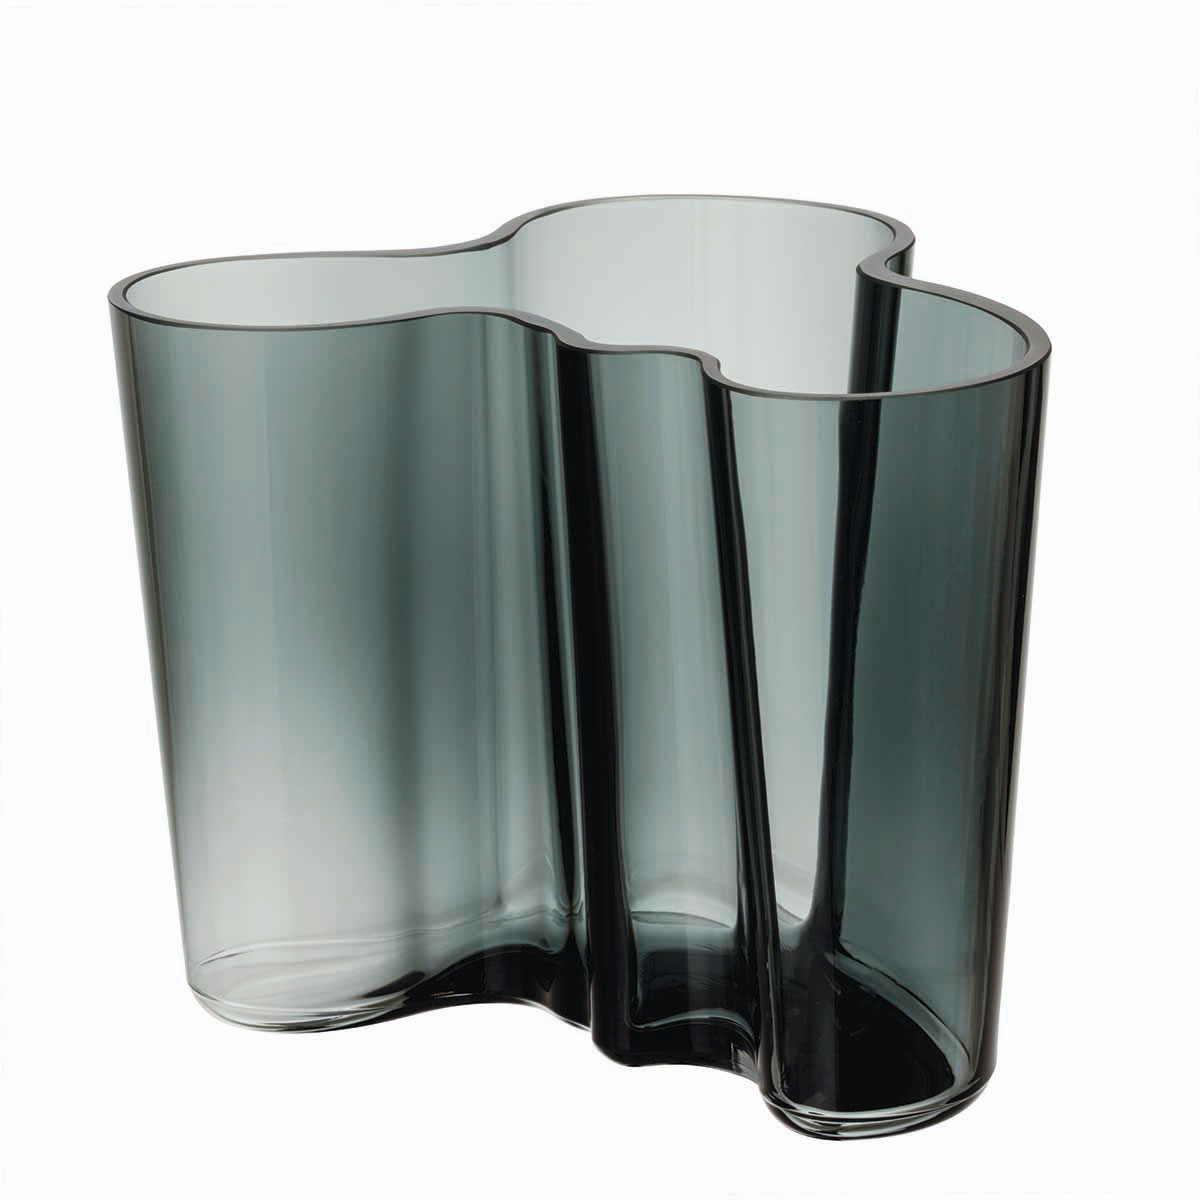 "Iittala Alvar Aalto 4 3/4"" Vase, Dark Grey"